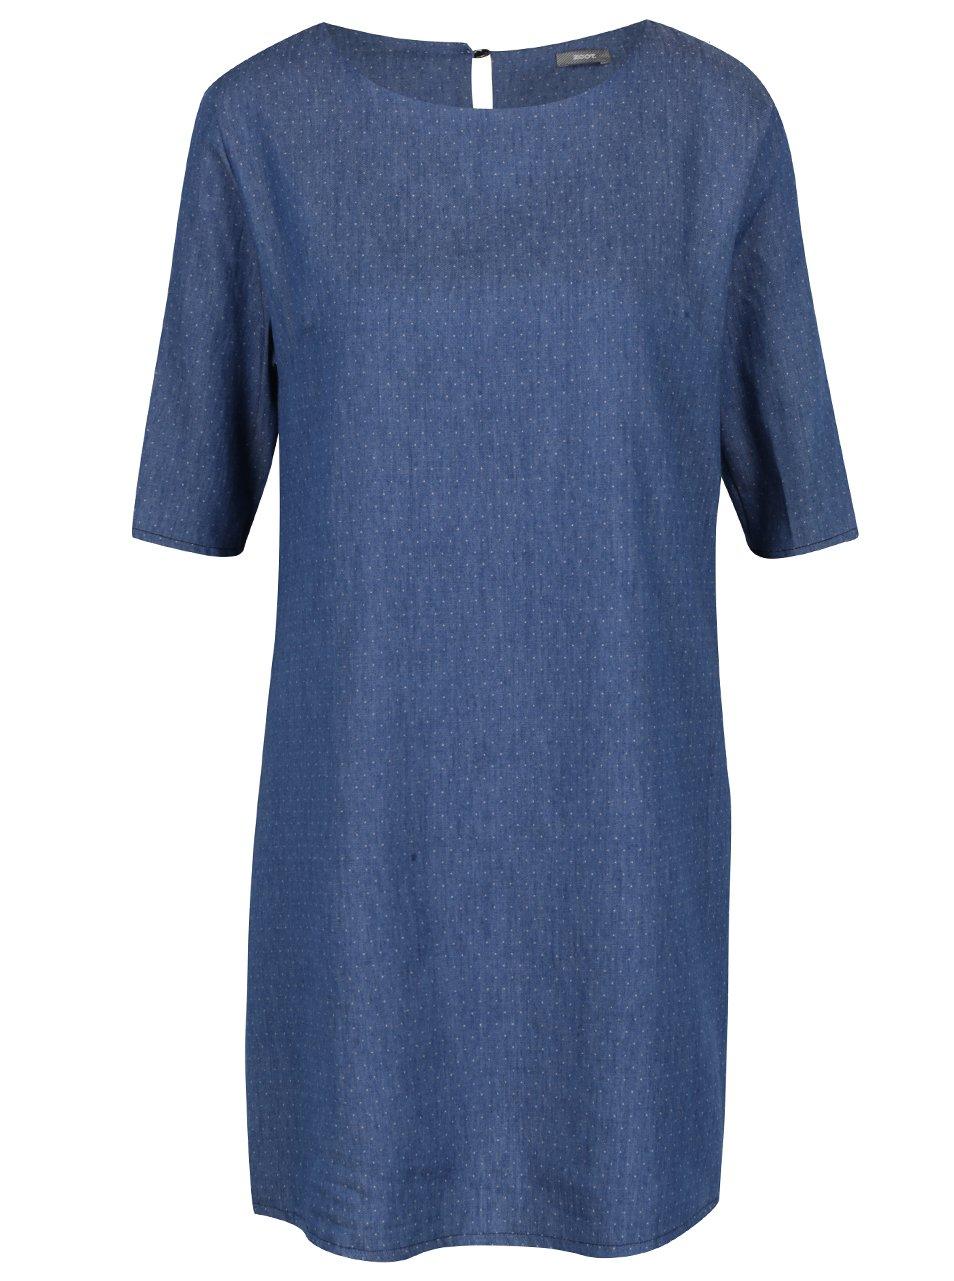 4521cbb487b8 Tmavě modré puntíkované džínové šaty ZOOT - Akční cena